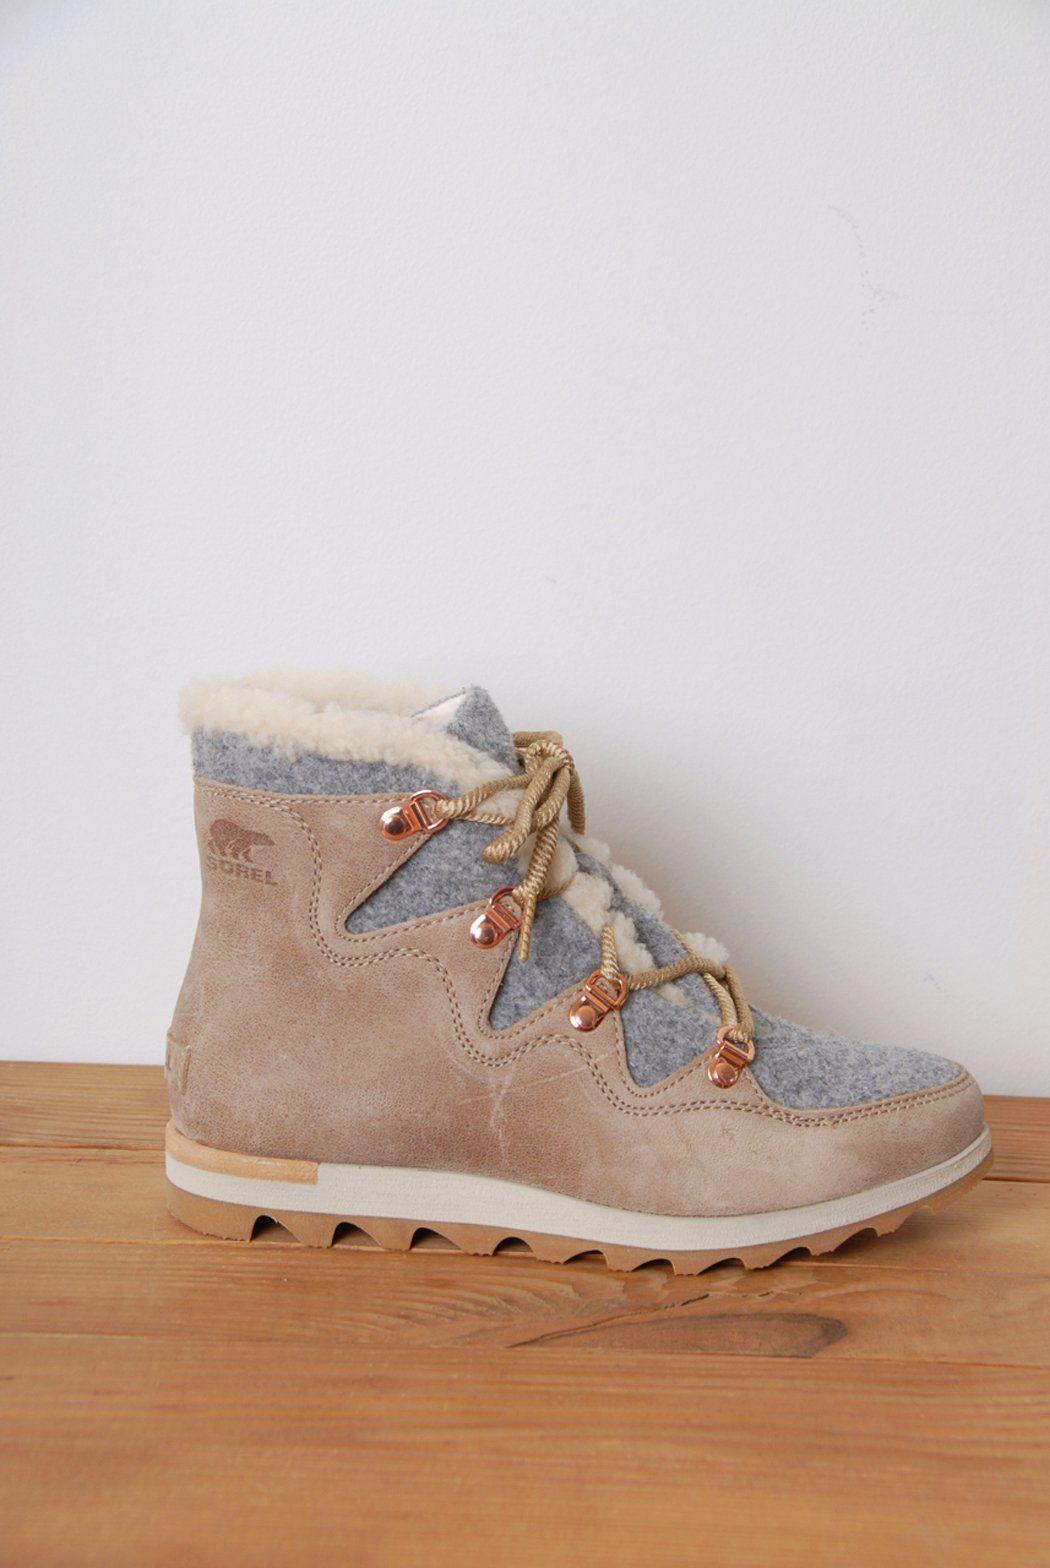 Sorel Sneakchic Alpine Boot Just My Style Sorel Boots